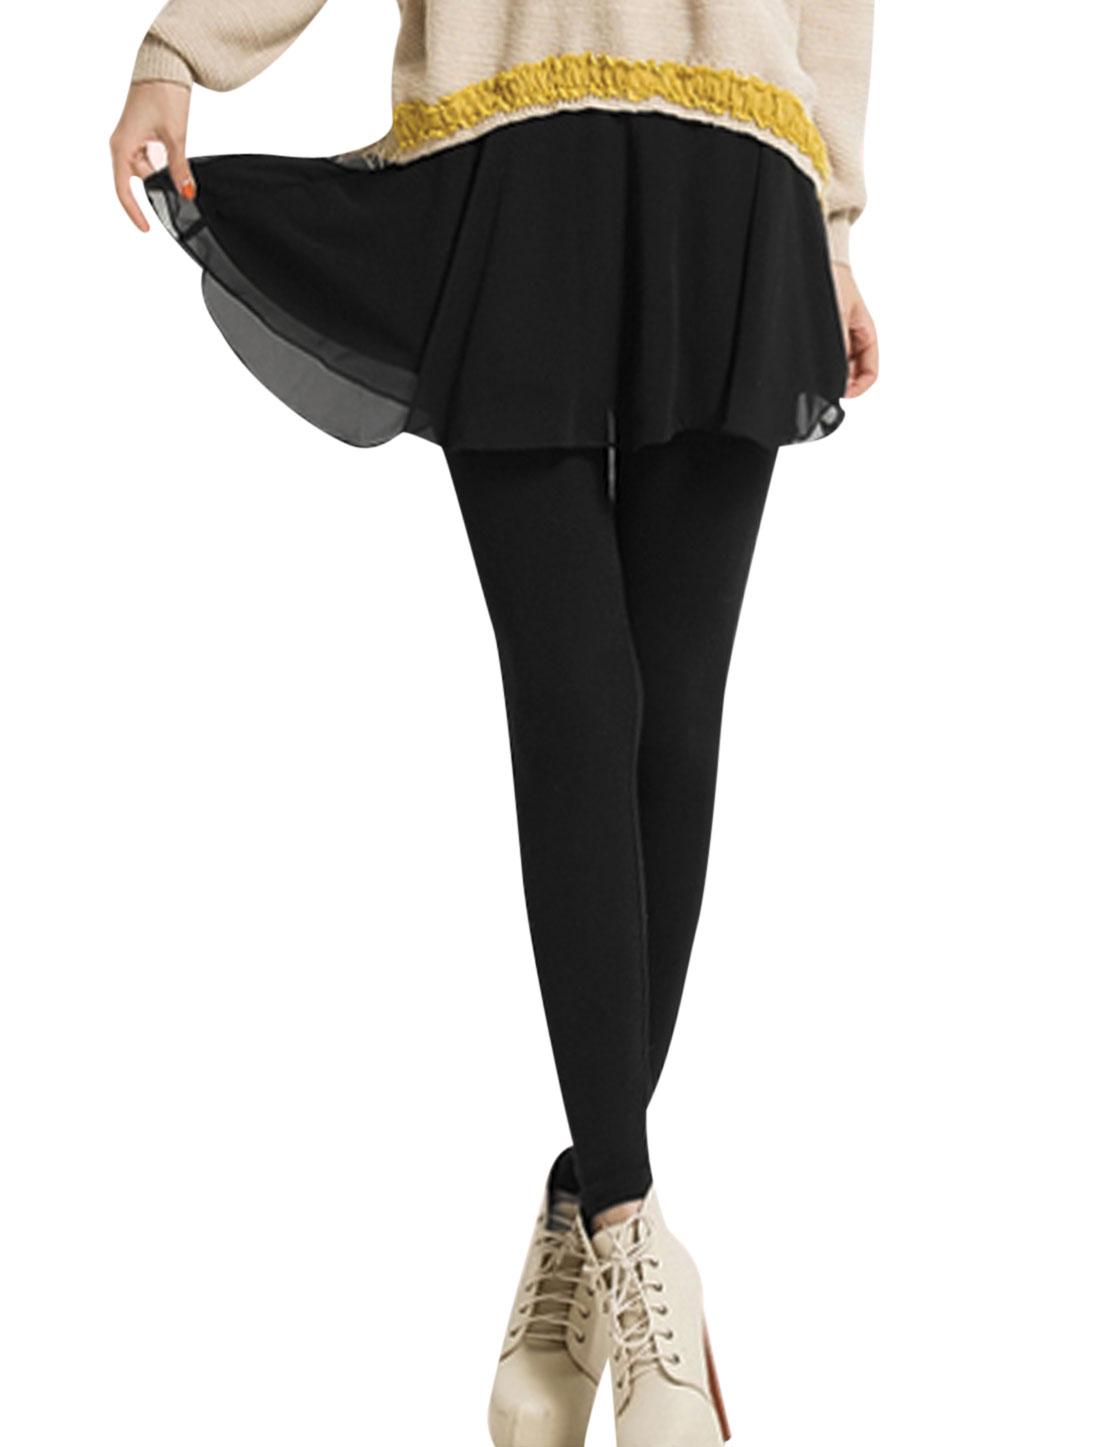 Lady Elastic Waist Chiffon Panel Skirt Leggings Black XS